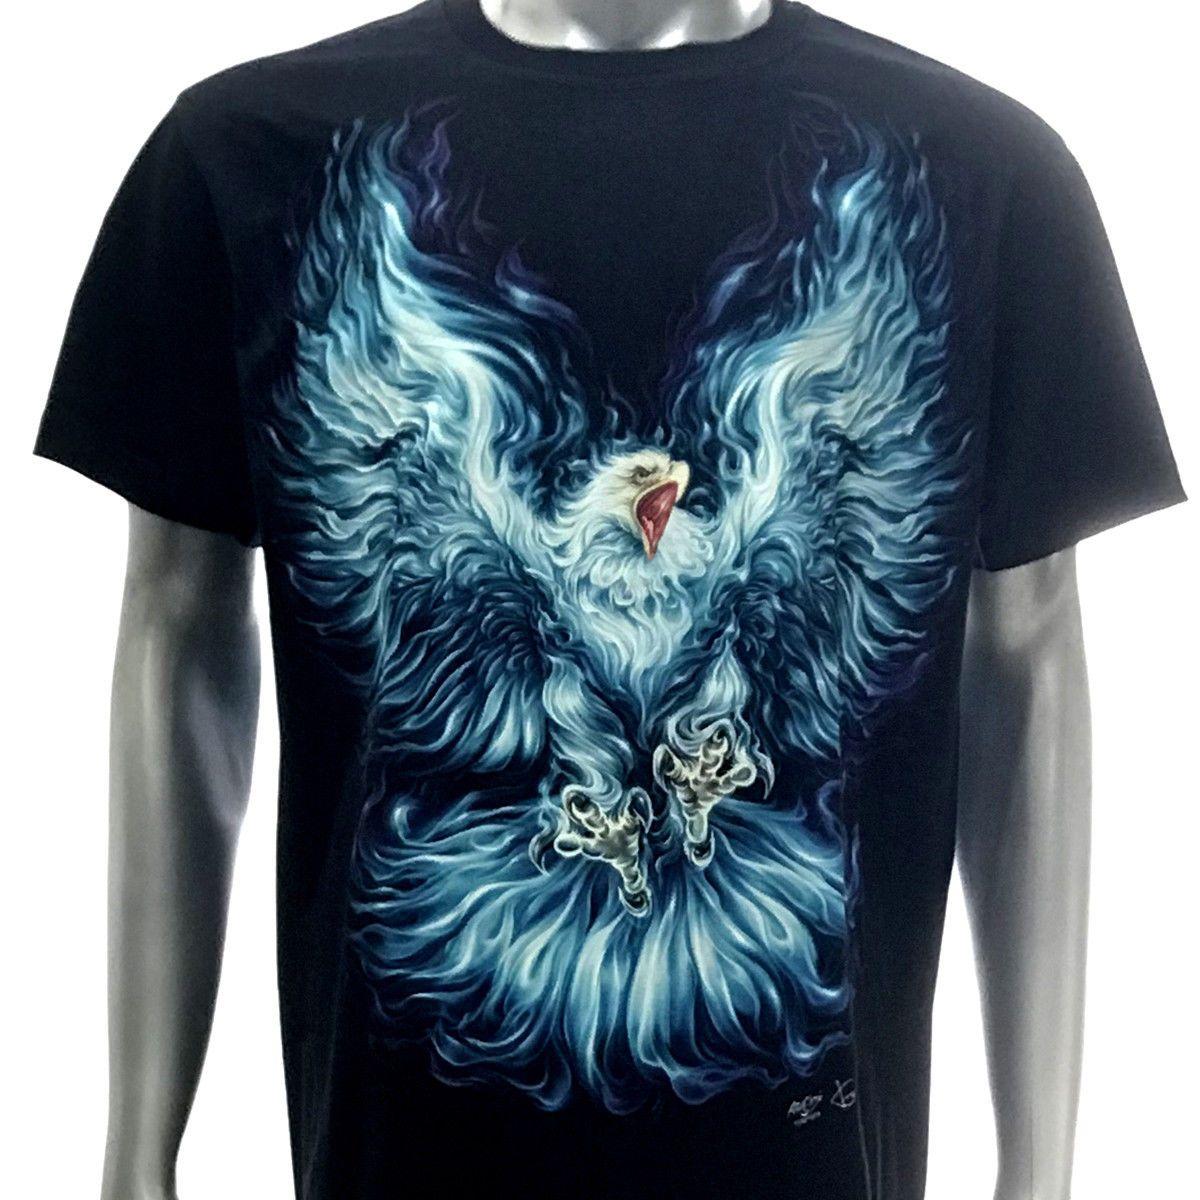 8e667bf17b690 h20 Rock Chang T-shirt Tattoo Glow in Dark HD PRINT Eagle Cool Casual  Cotton Tee